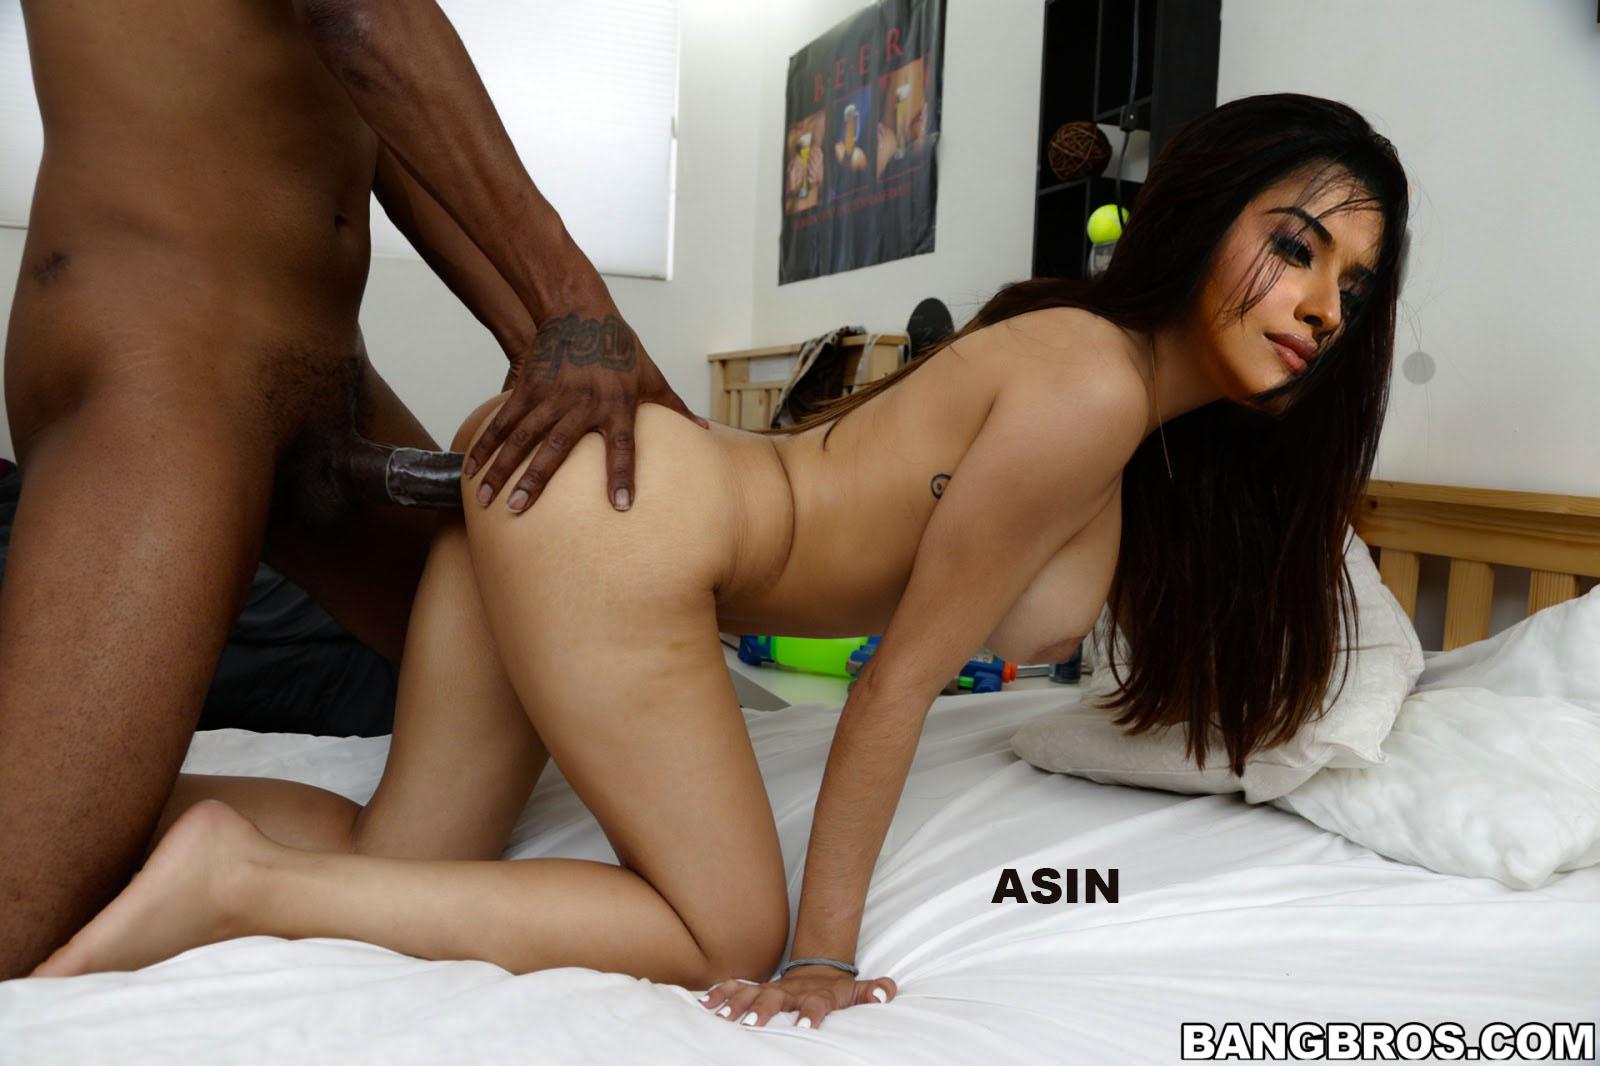 Porn video asin-9647